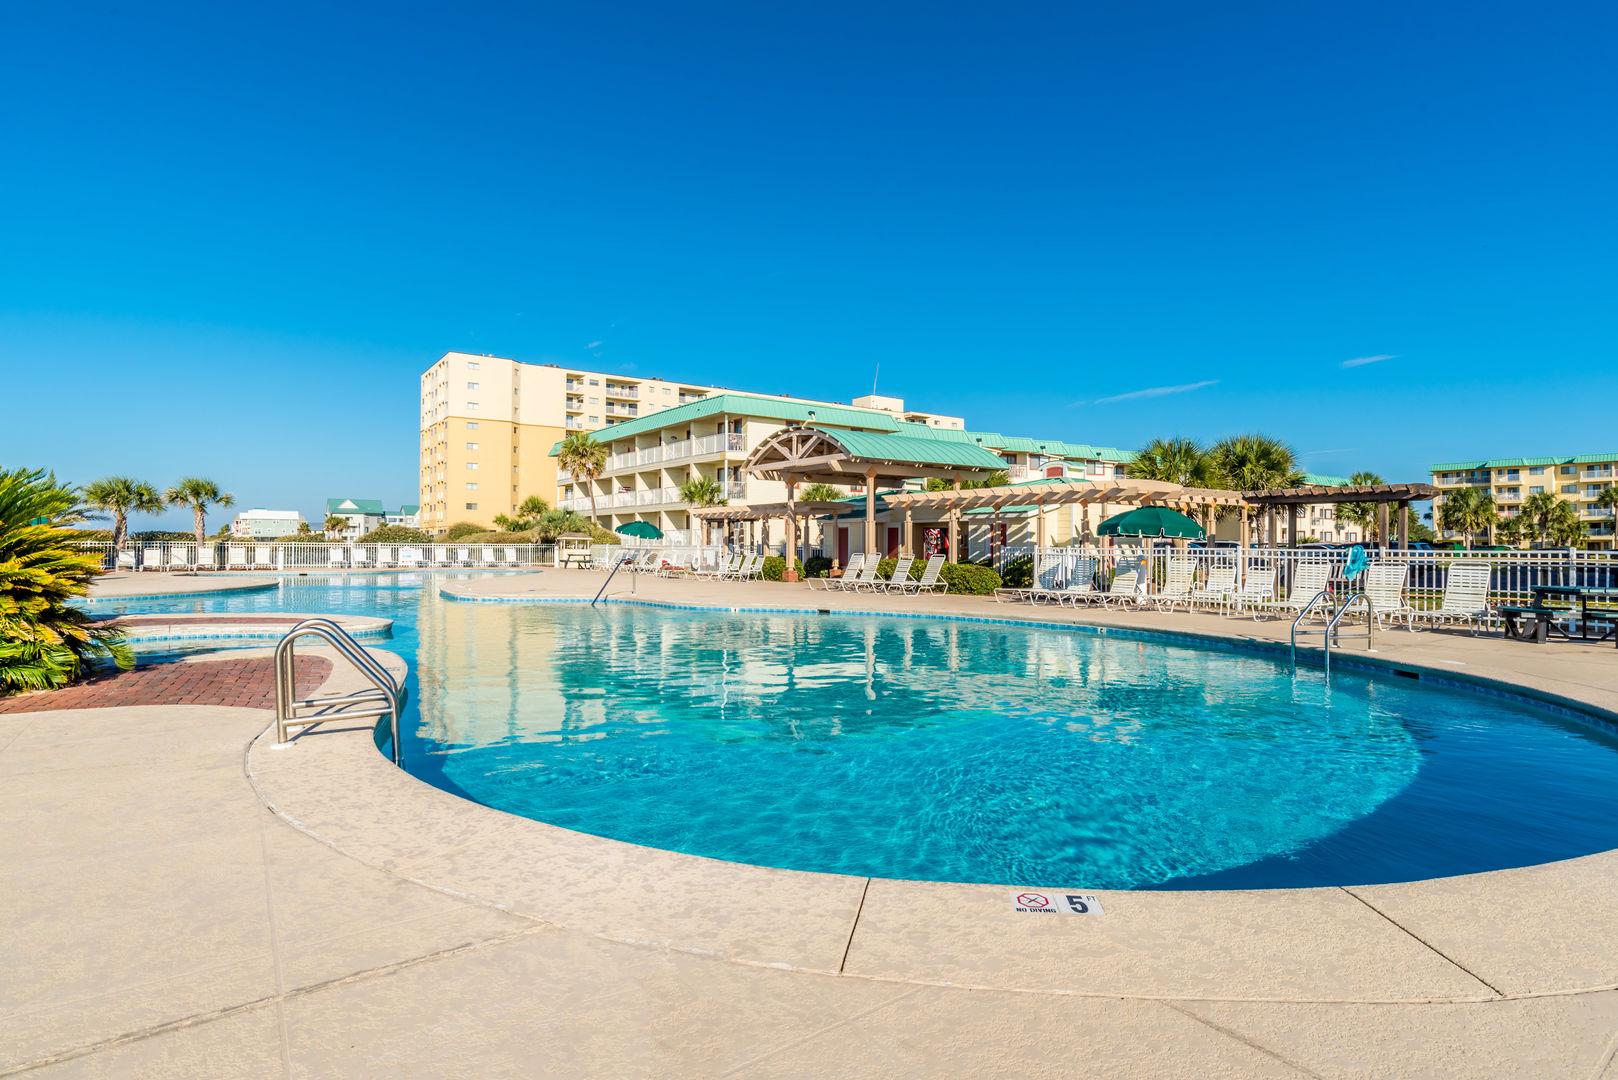 Aqua Viva Vacation Rental In Gulf Shores Harris Properties